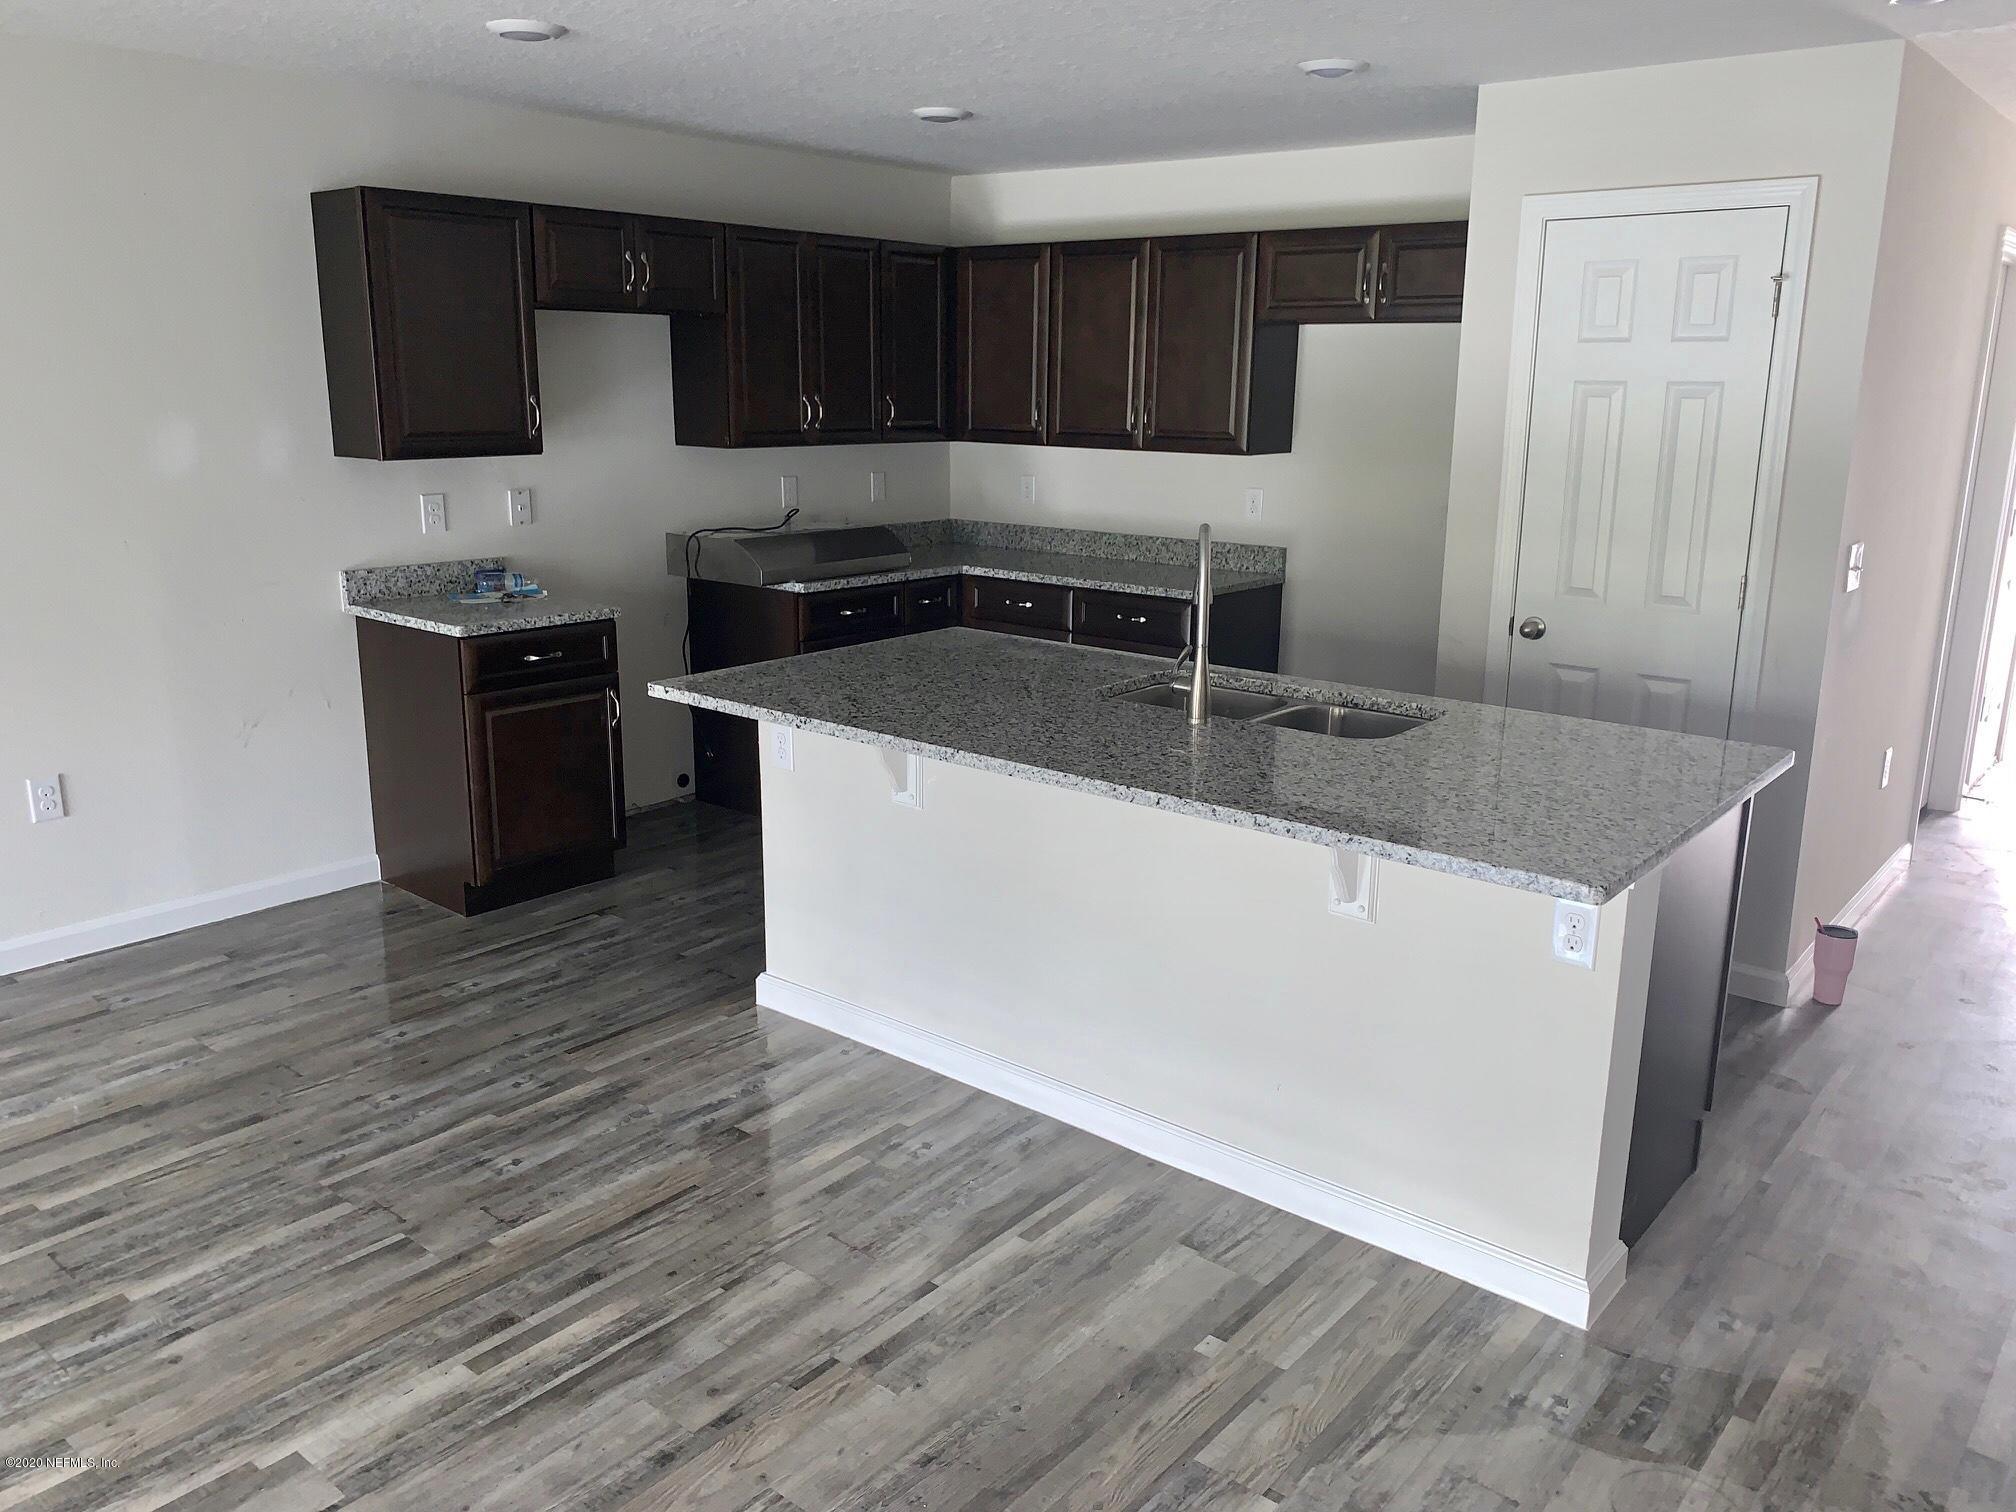 47 PONCE DELEON, PALM COAST, FLORIDA 32164, 3 Bedrooms Bedrooms, ,2 BathroomsBathrooms,Rental,For Rent,PONCE DELEON,1053218